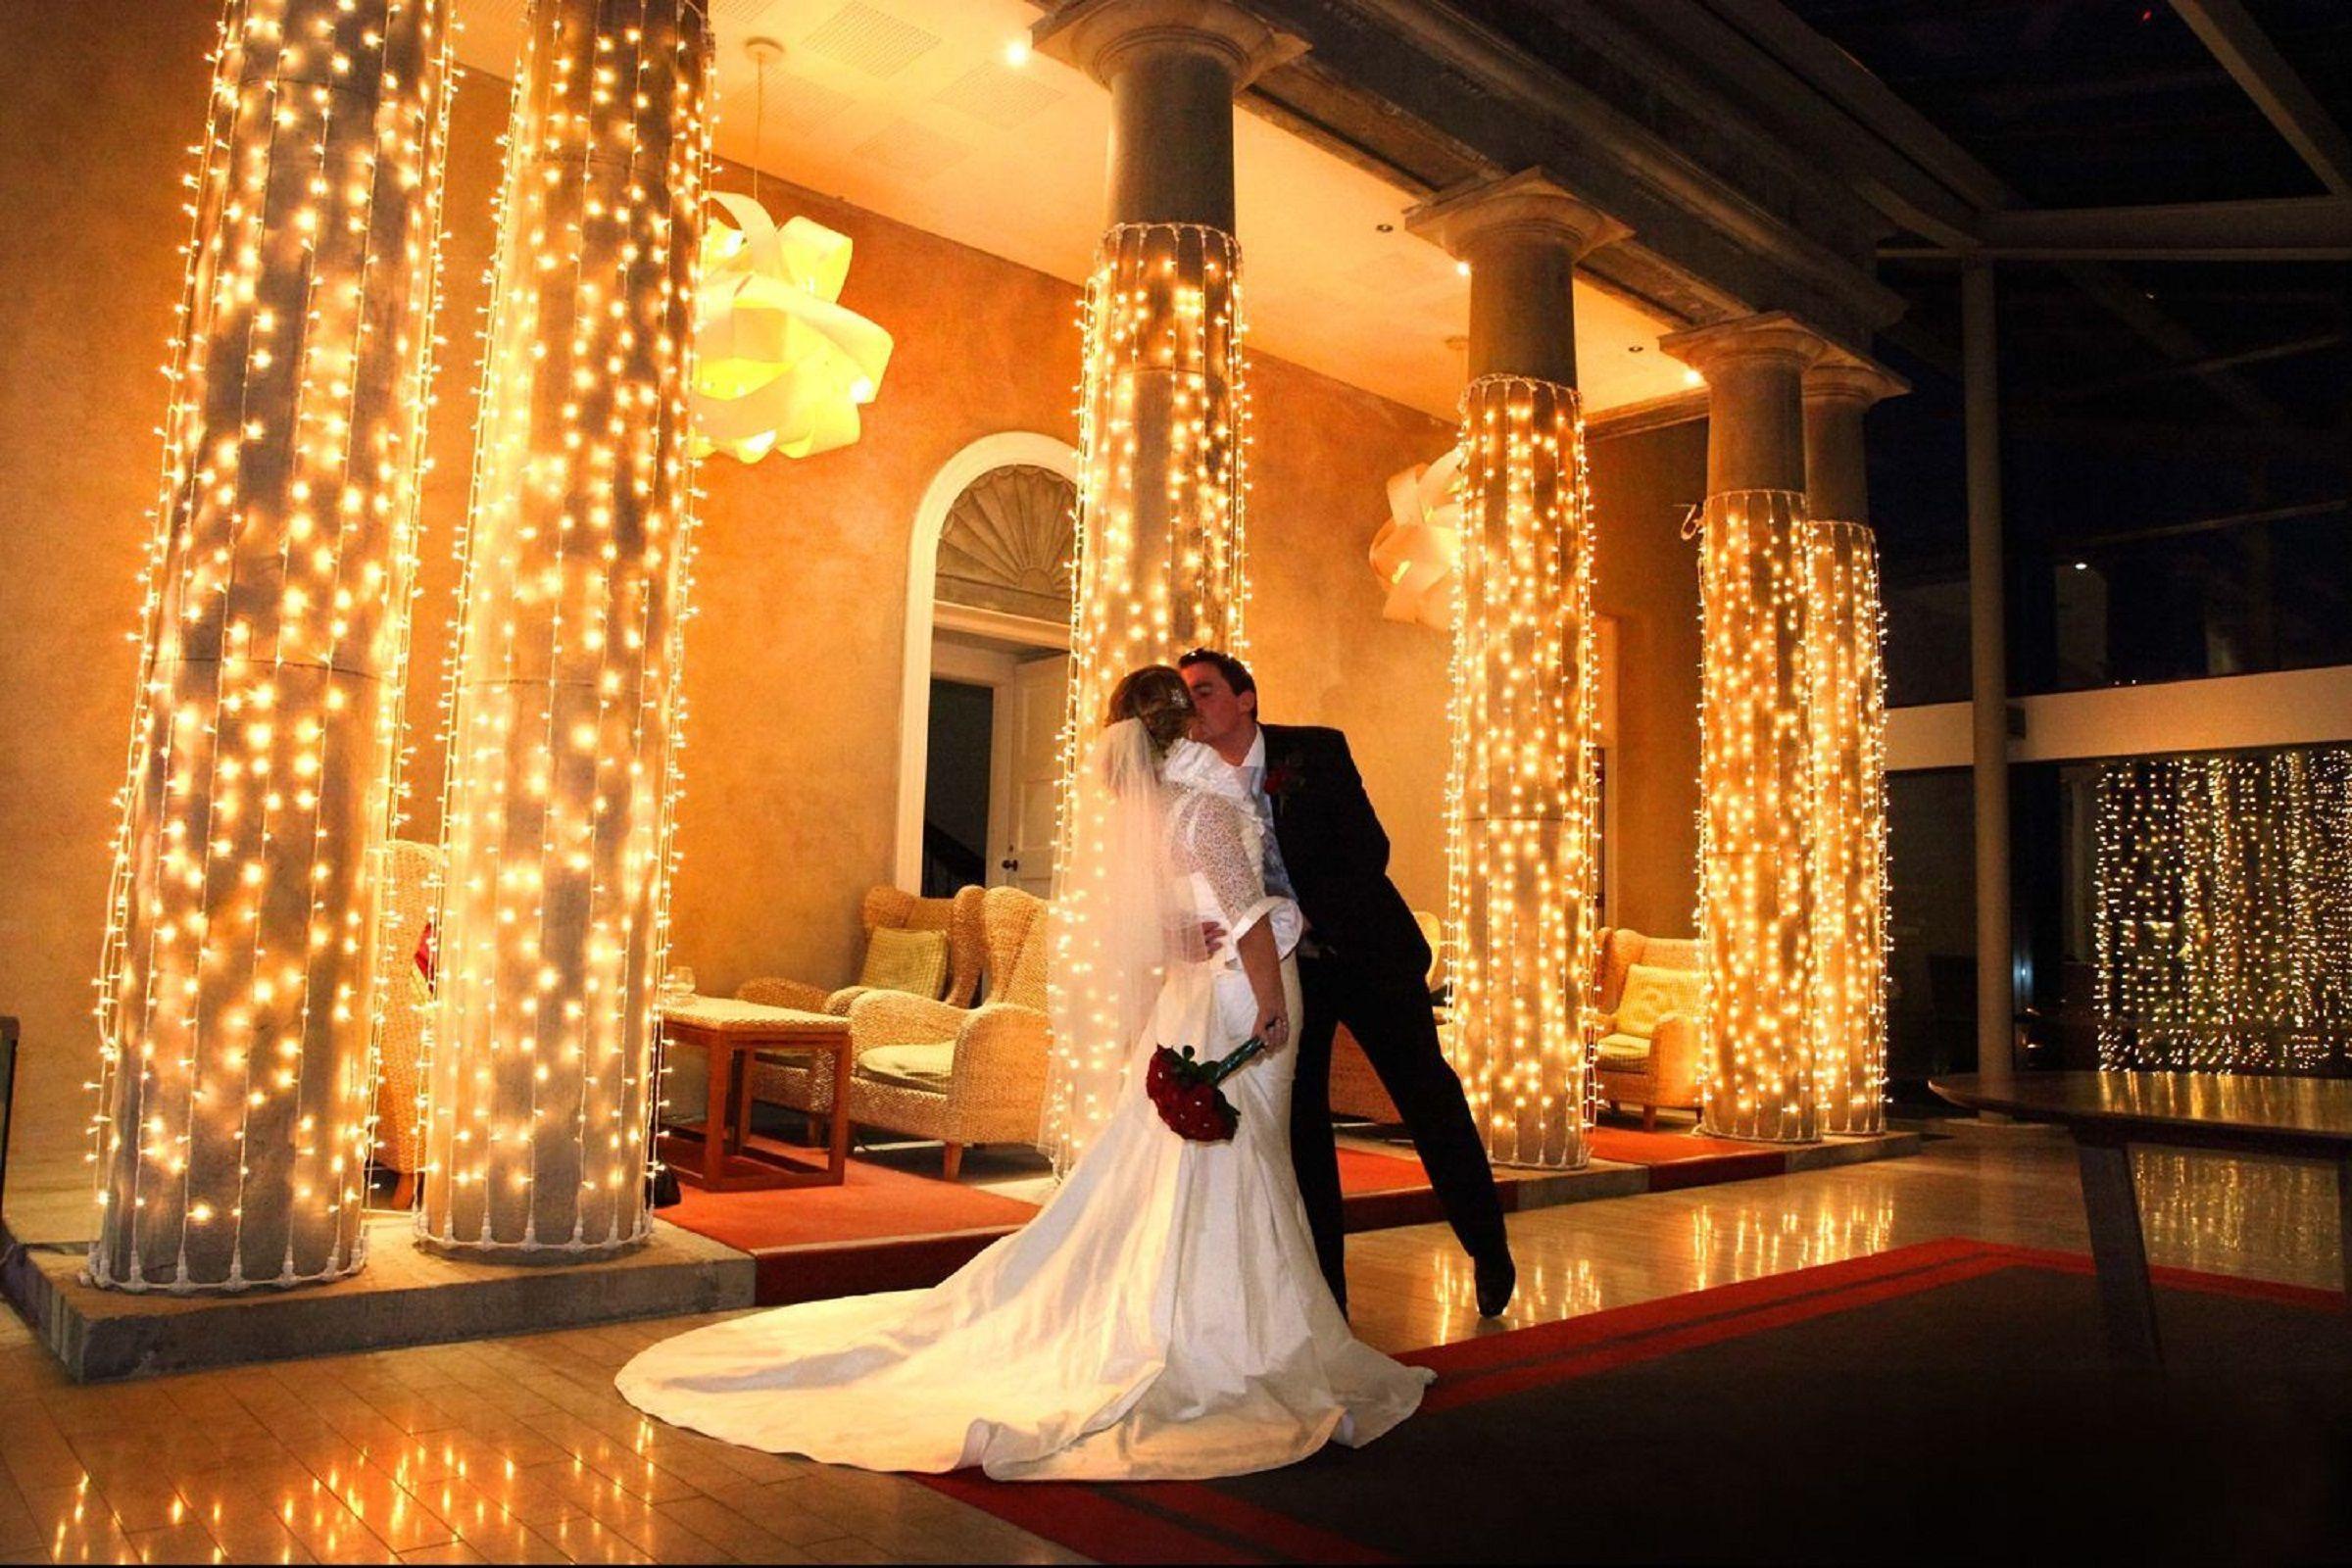 Magical Christmas Wedding At The Radisson Blu Farnham Estate Golf Spa Resort In Co Cavan Ireland